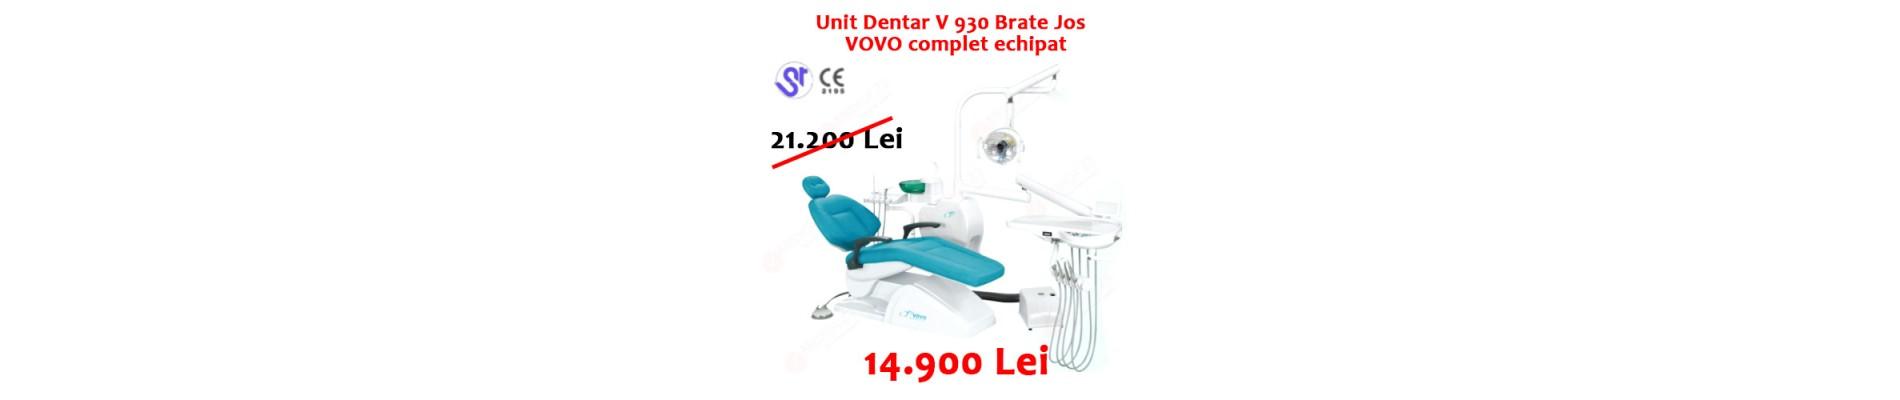 Unit Dentar V 930 Brate Jos - VOVO complet echipat